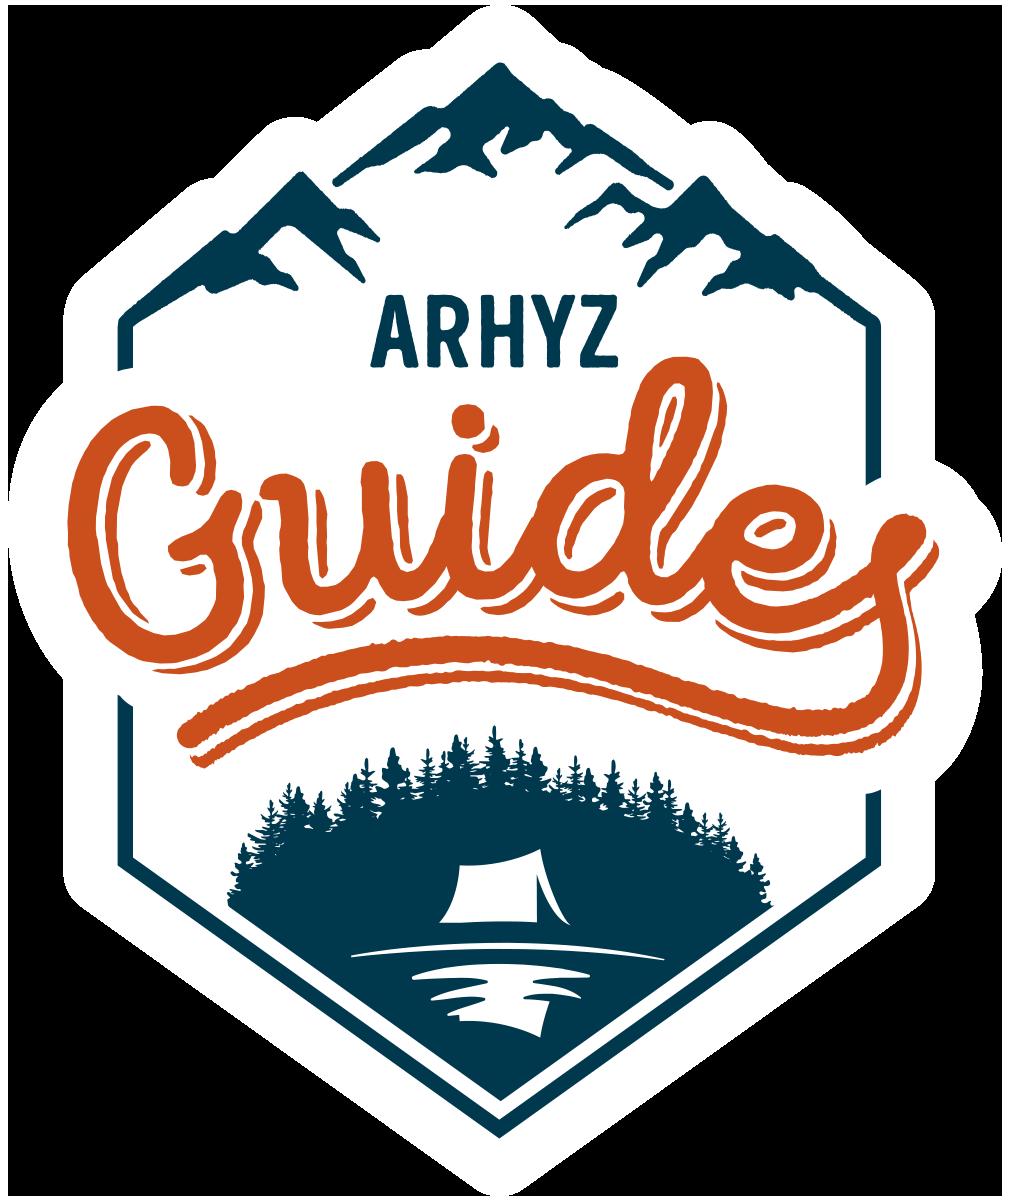 Arhyz Guide